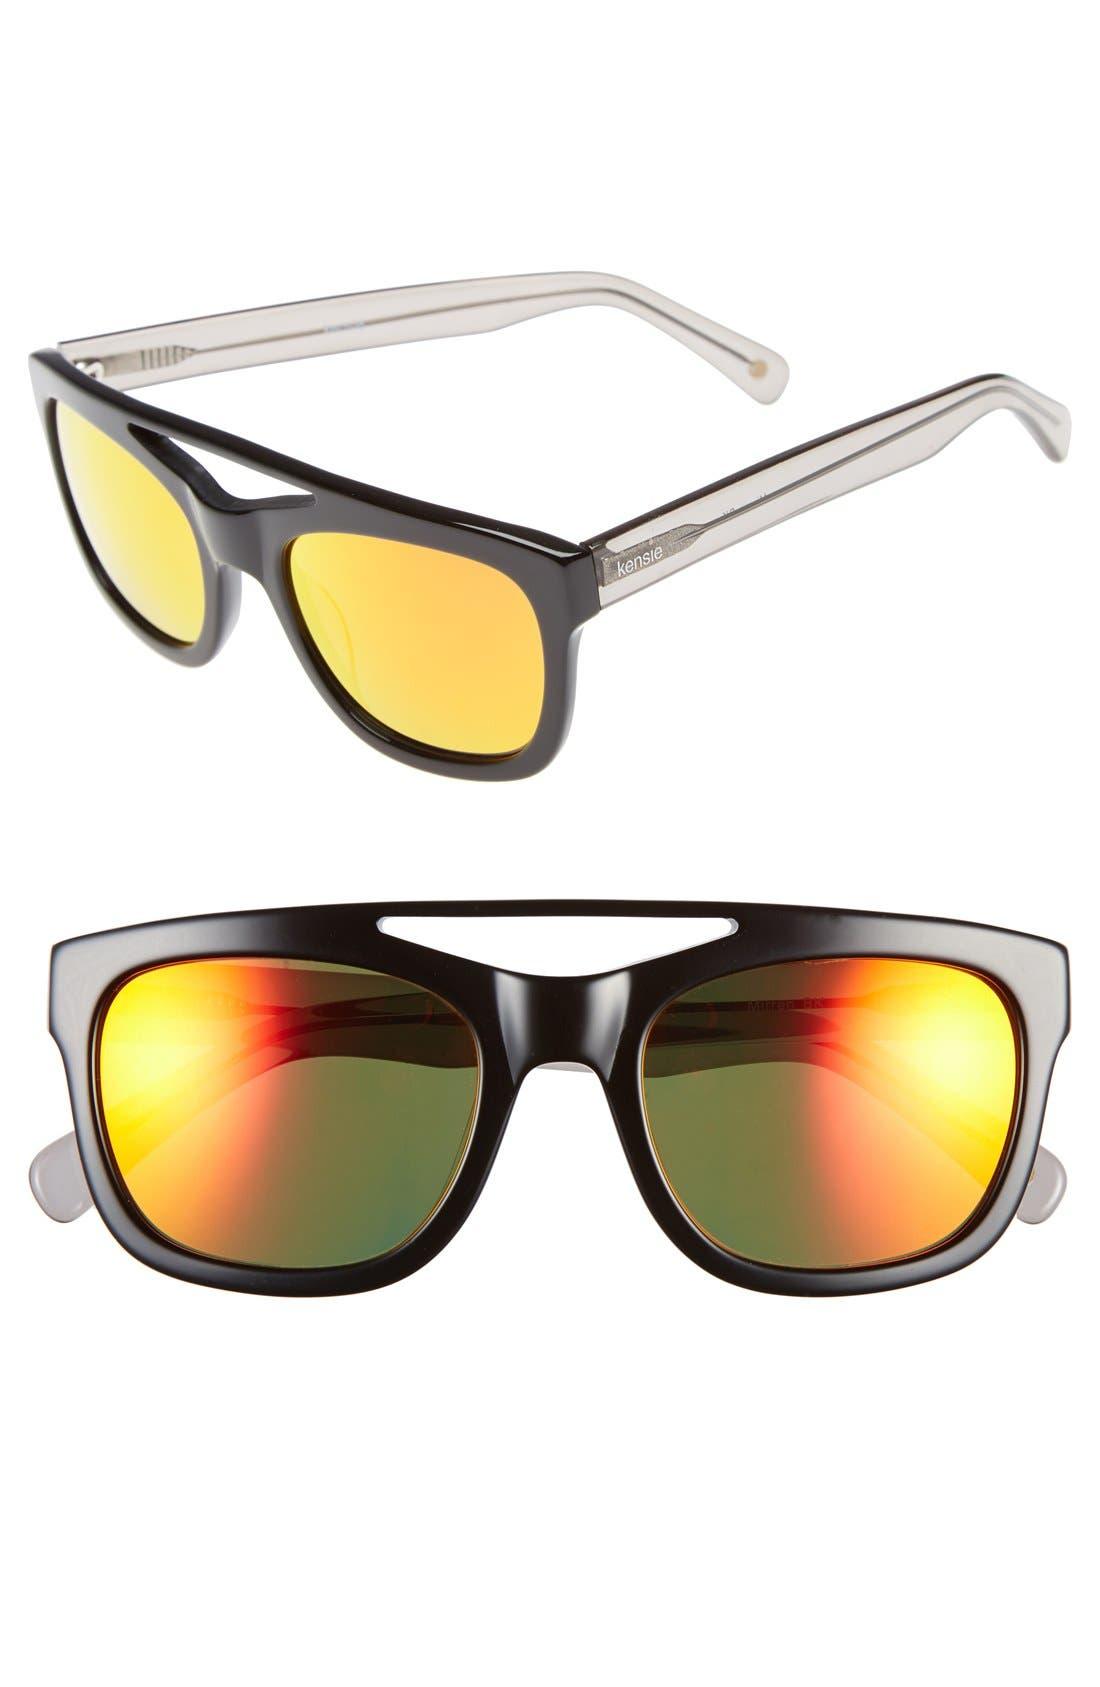 Main Image - kensie 'Mirren' 52mm Aviator Sunglasses